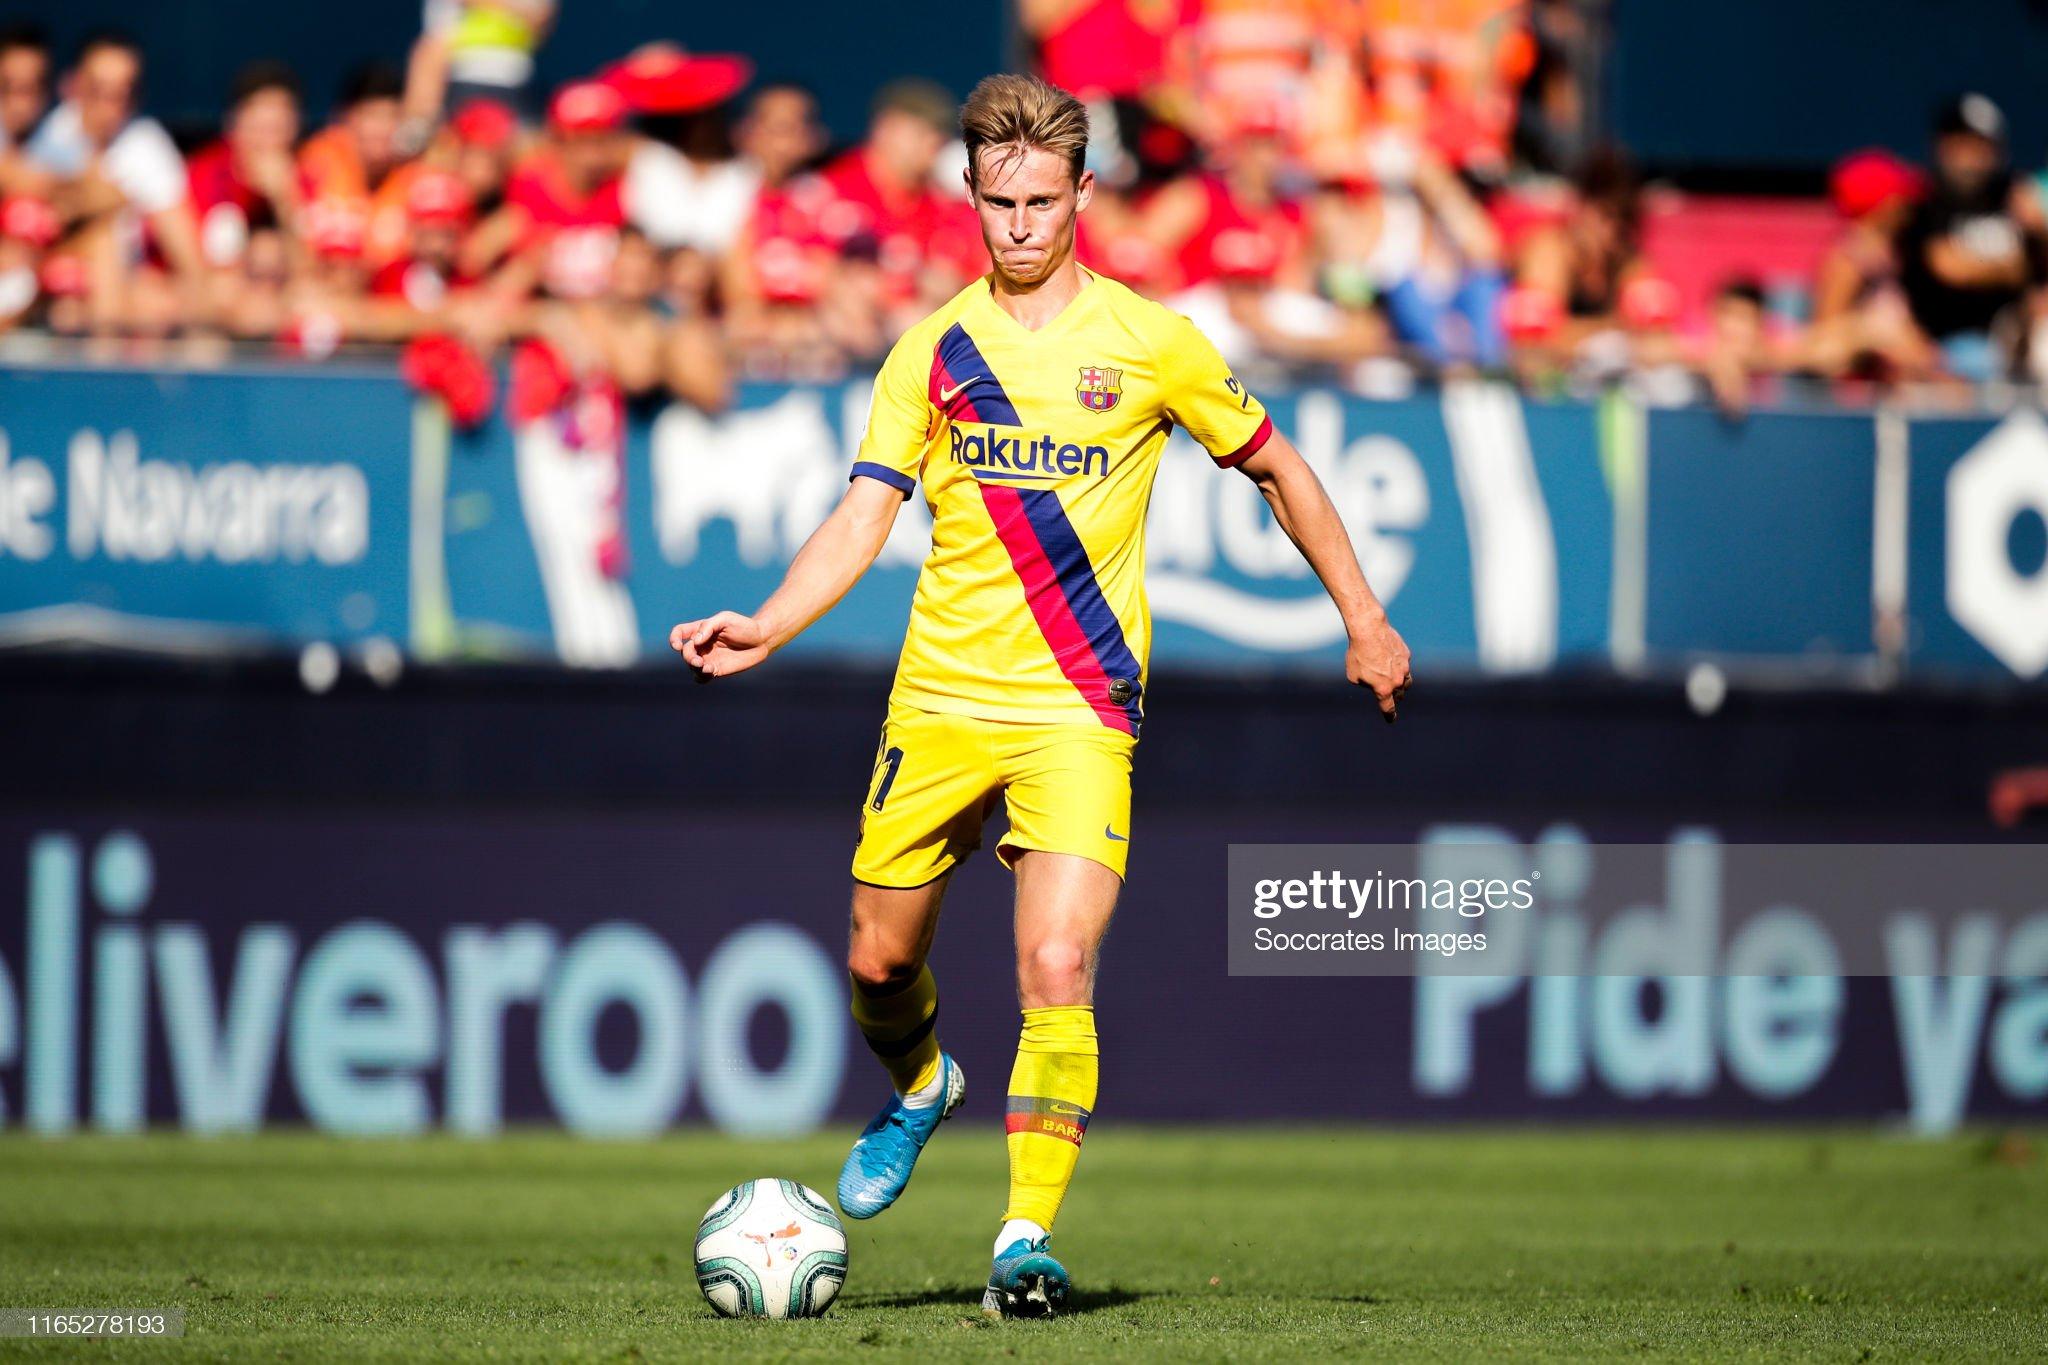 صور مباراة : أوساسونا - برشلونة 2-2 ( 31-08-2019 )  Frenkie-de-jong-of-fc-barcelona-during-the-la-liga-santander-match-picture-id1165278193?s=2048x2048